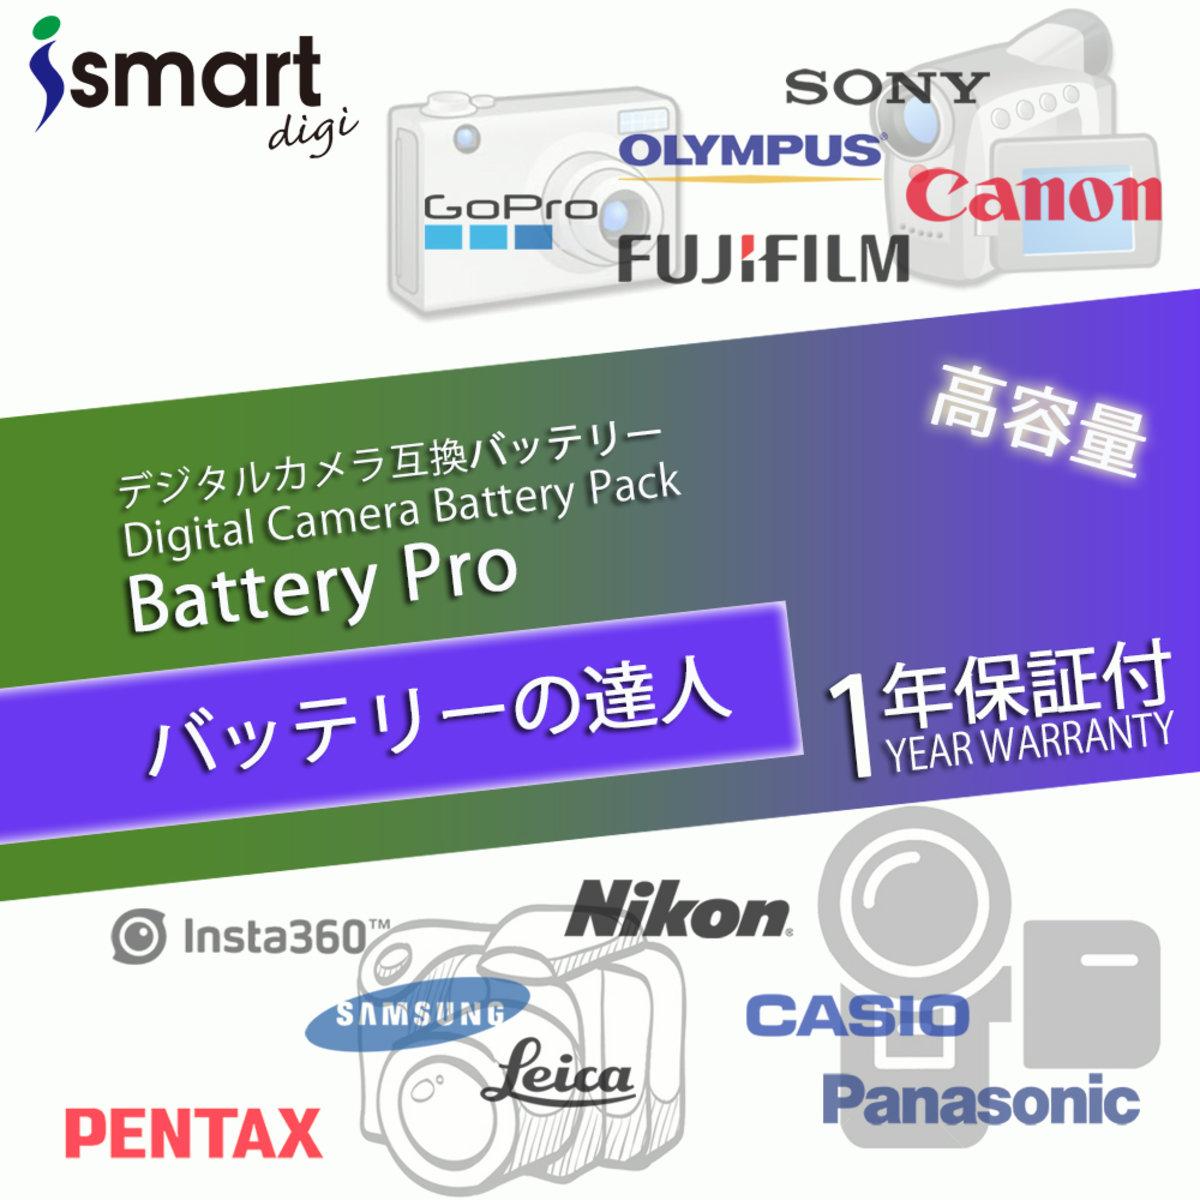 Panasonic Digital Camera Battery (For:DMC-LX1GK, DMC-LX2, DMC-LX3DMC-LX9 Series,DMC-LX9, DMC-LX9-H, DMC-LX9-K, DMC-LX9-R)